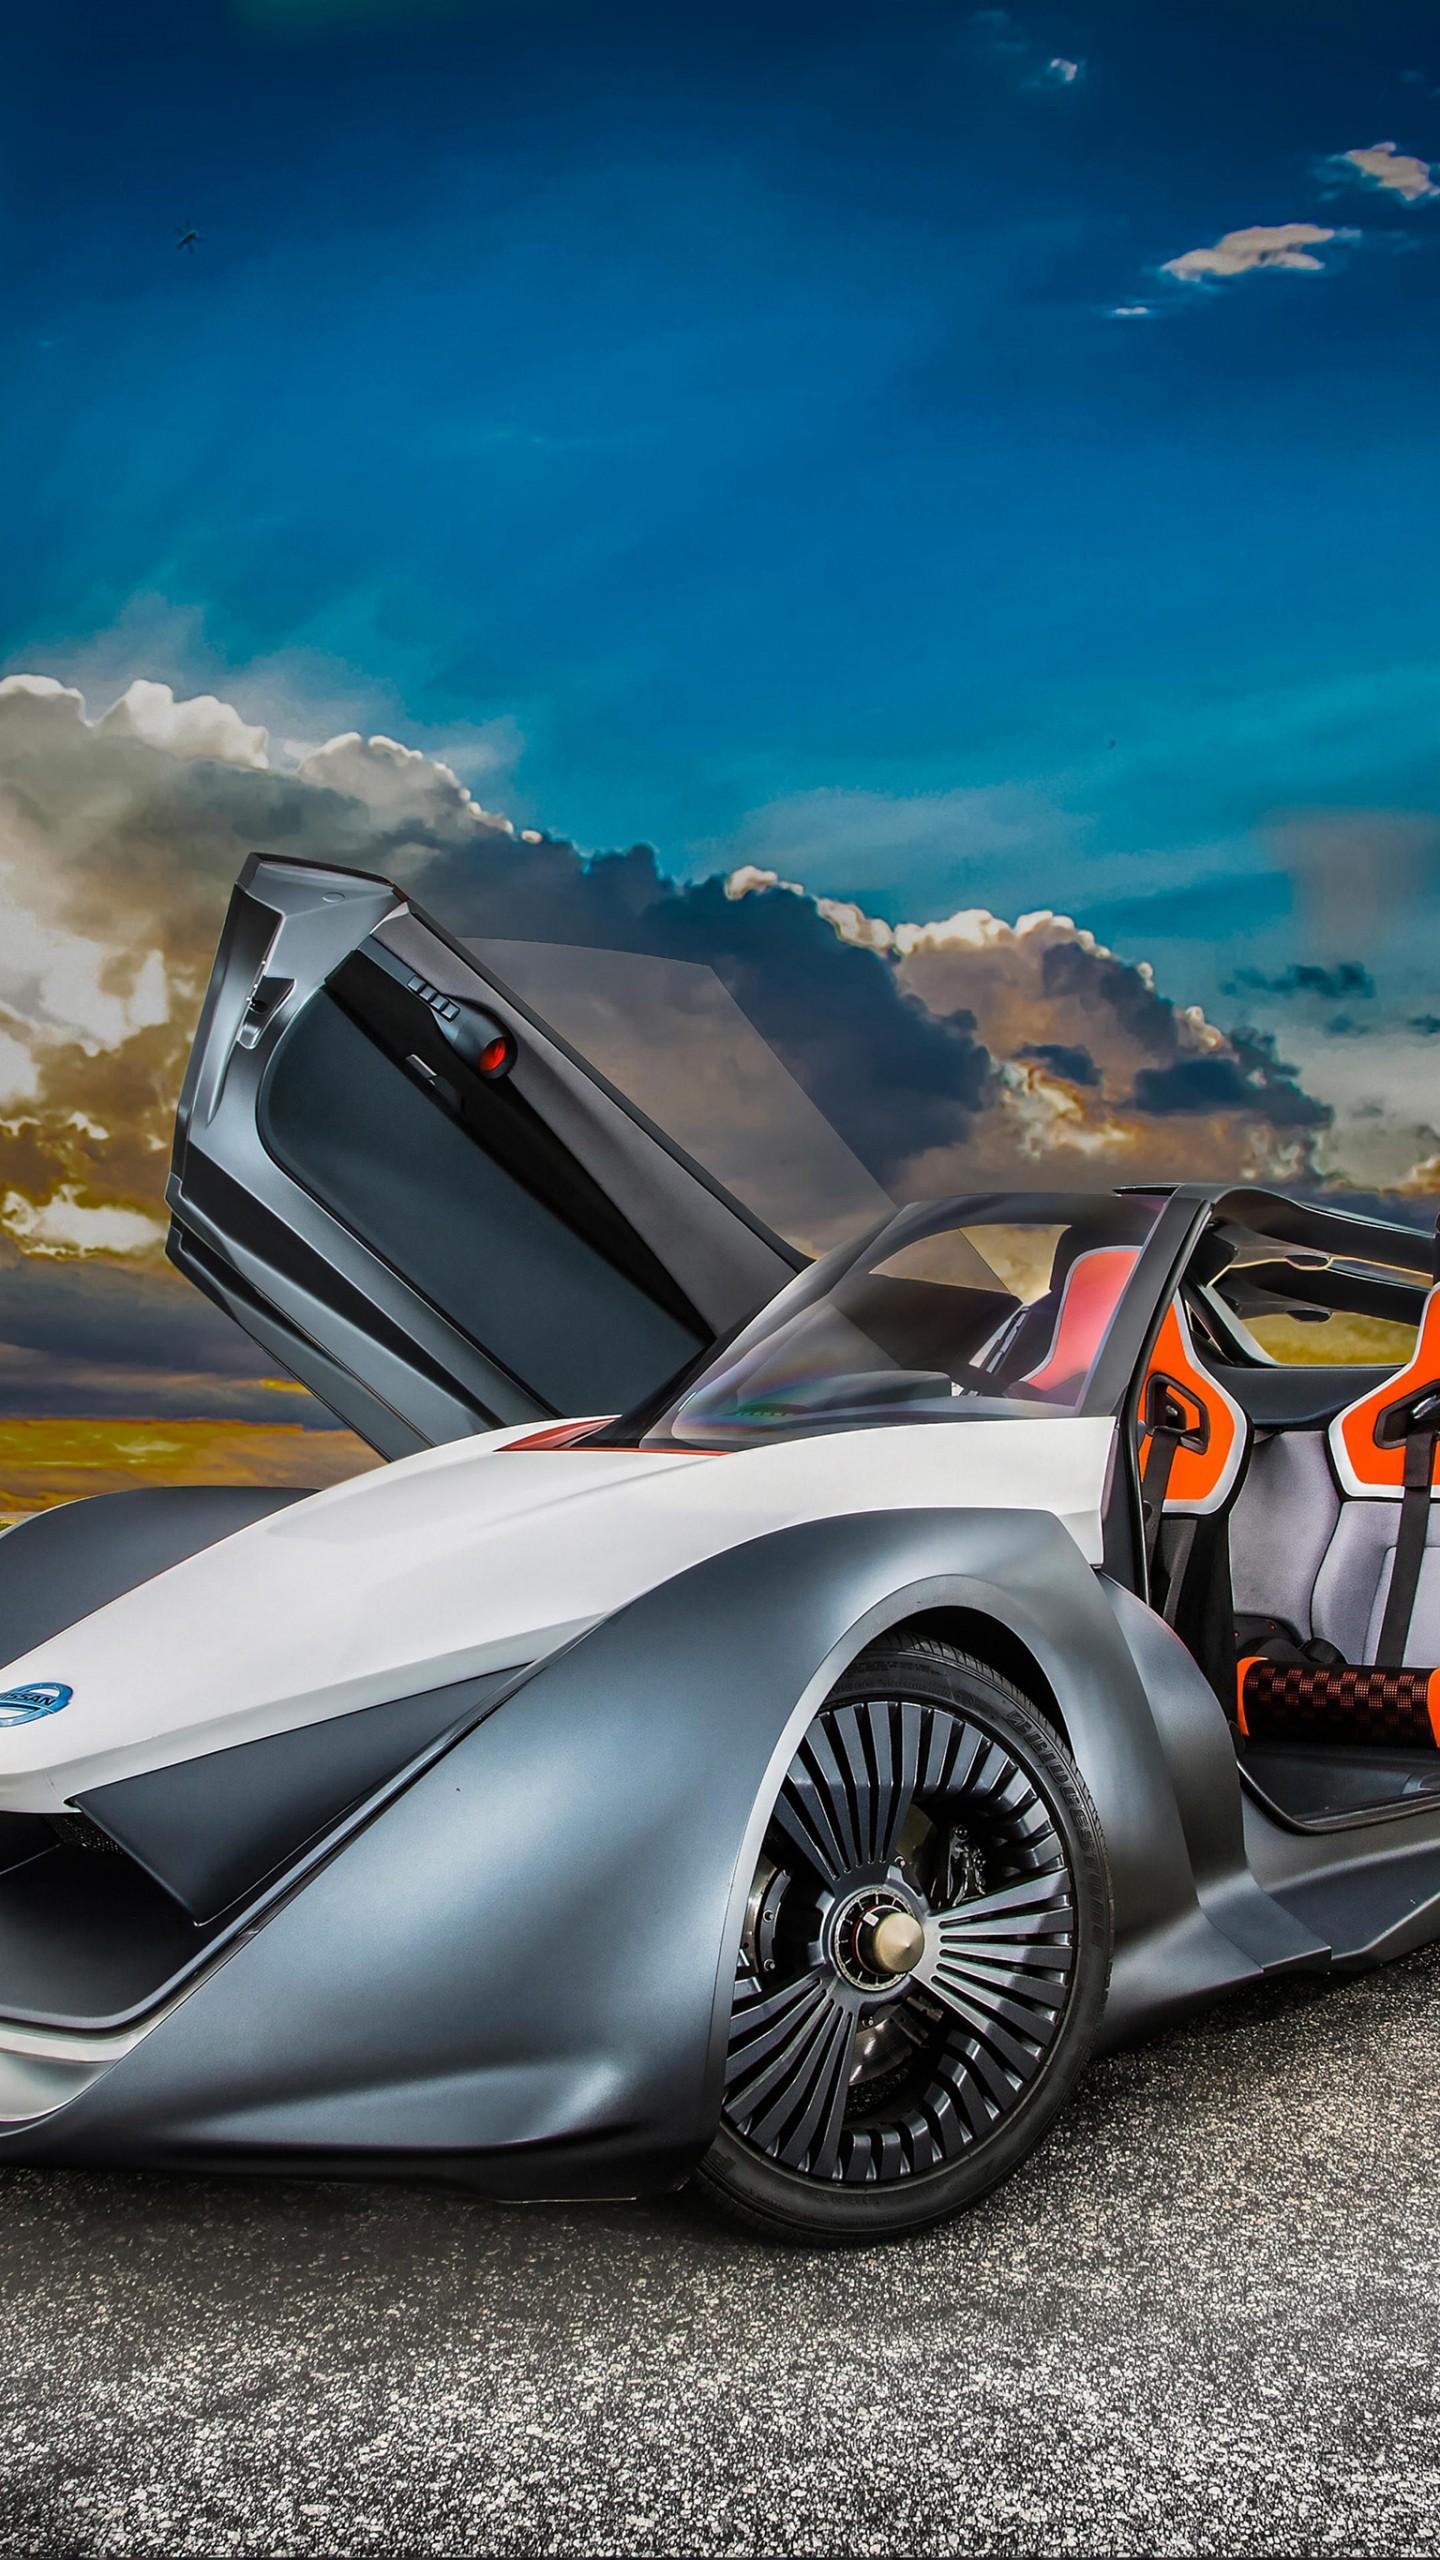 Wallpaper Nissan Bladeglider Supercar Electric Cars